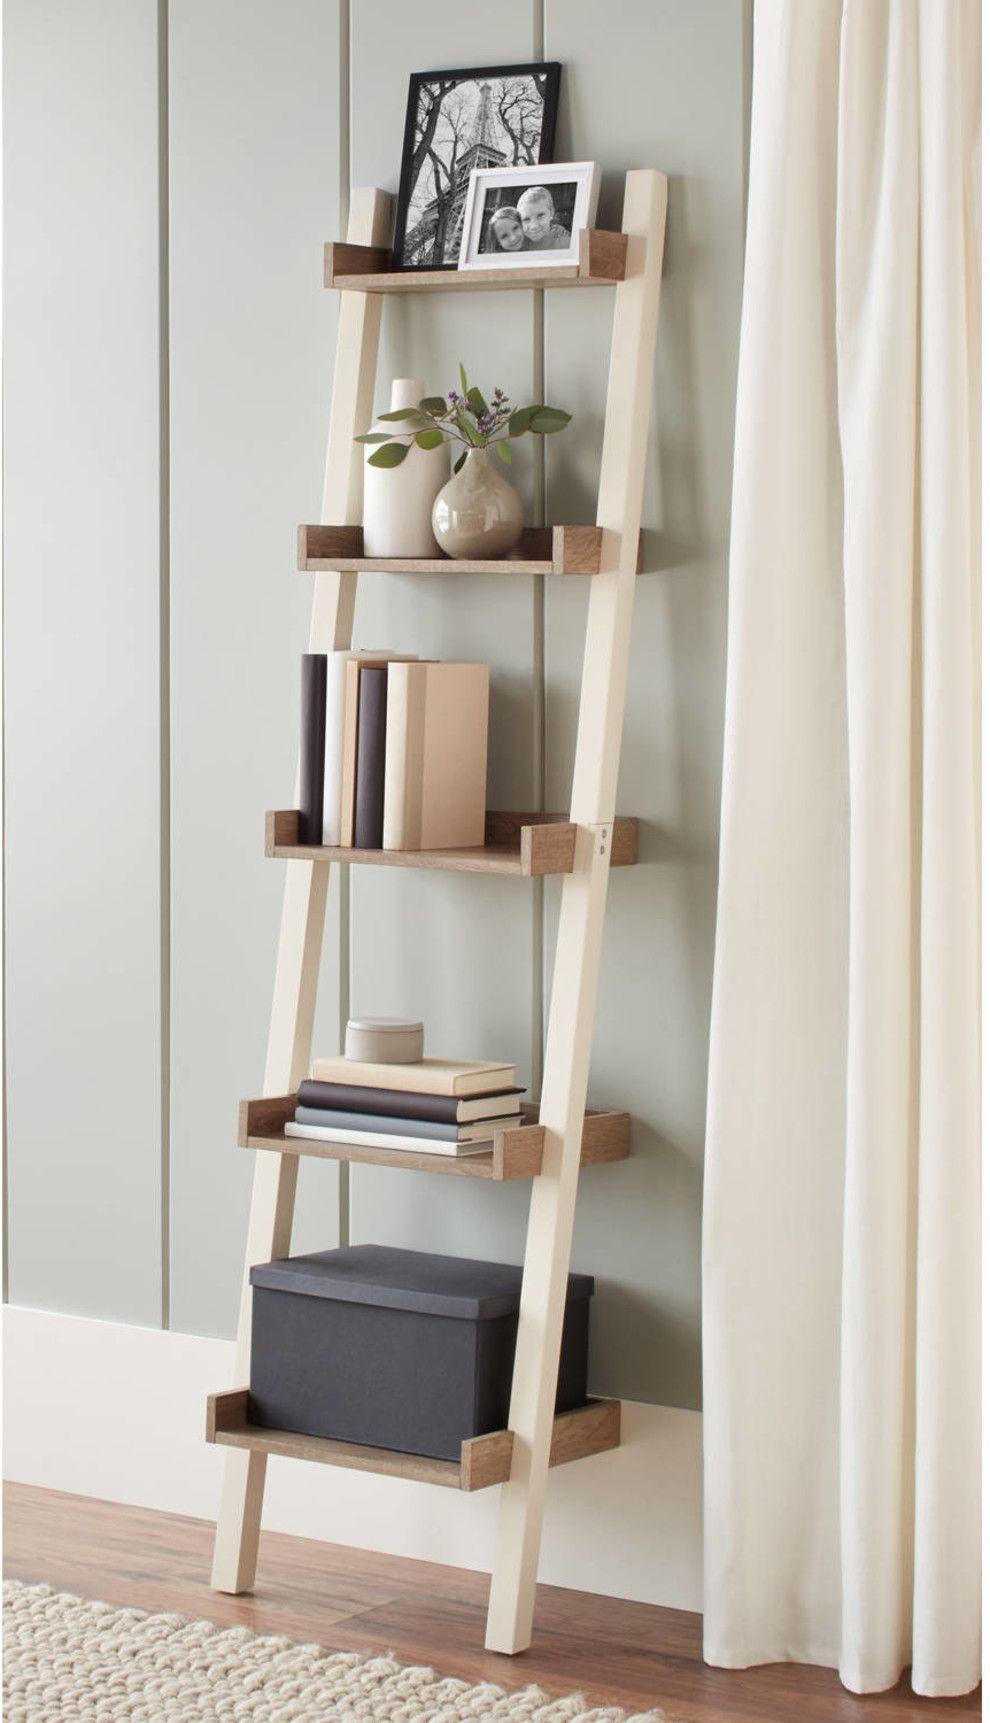 28 Surprisingly Attractive Pieces Of Decor You Can Get At Walmart Ladder Shelf Decor Narrow Ladder Shelf Diy Home Decor On A Budget